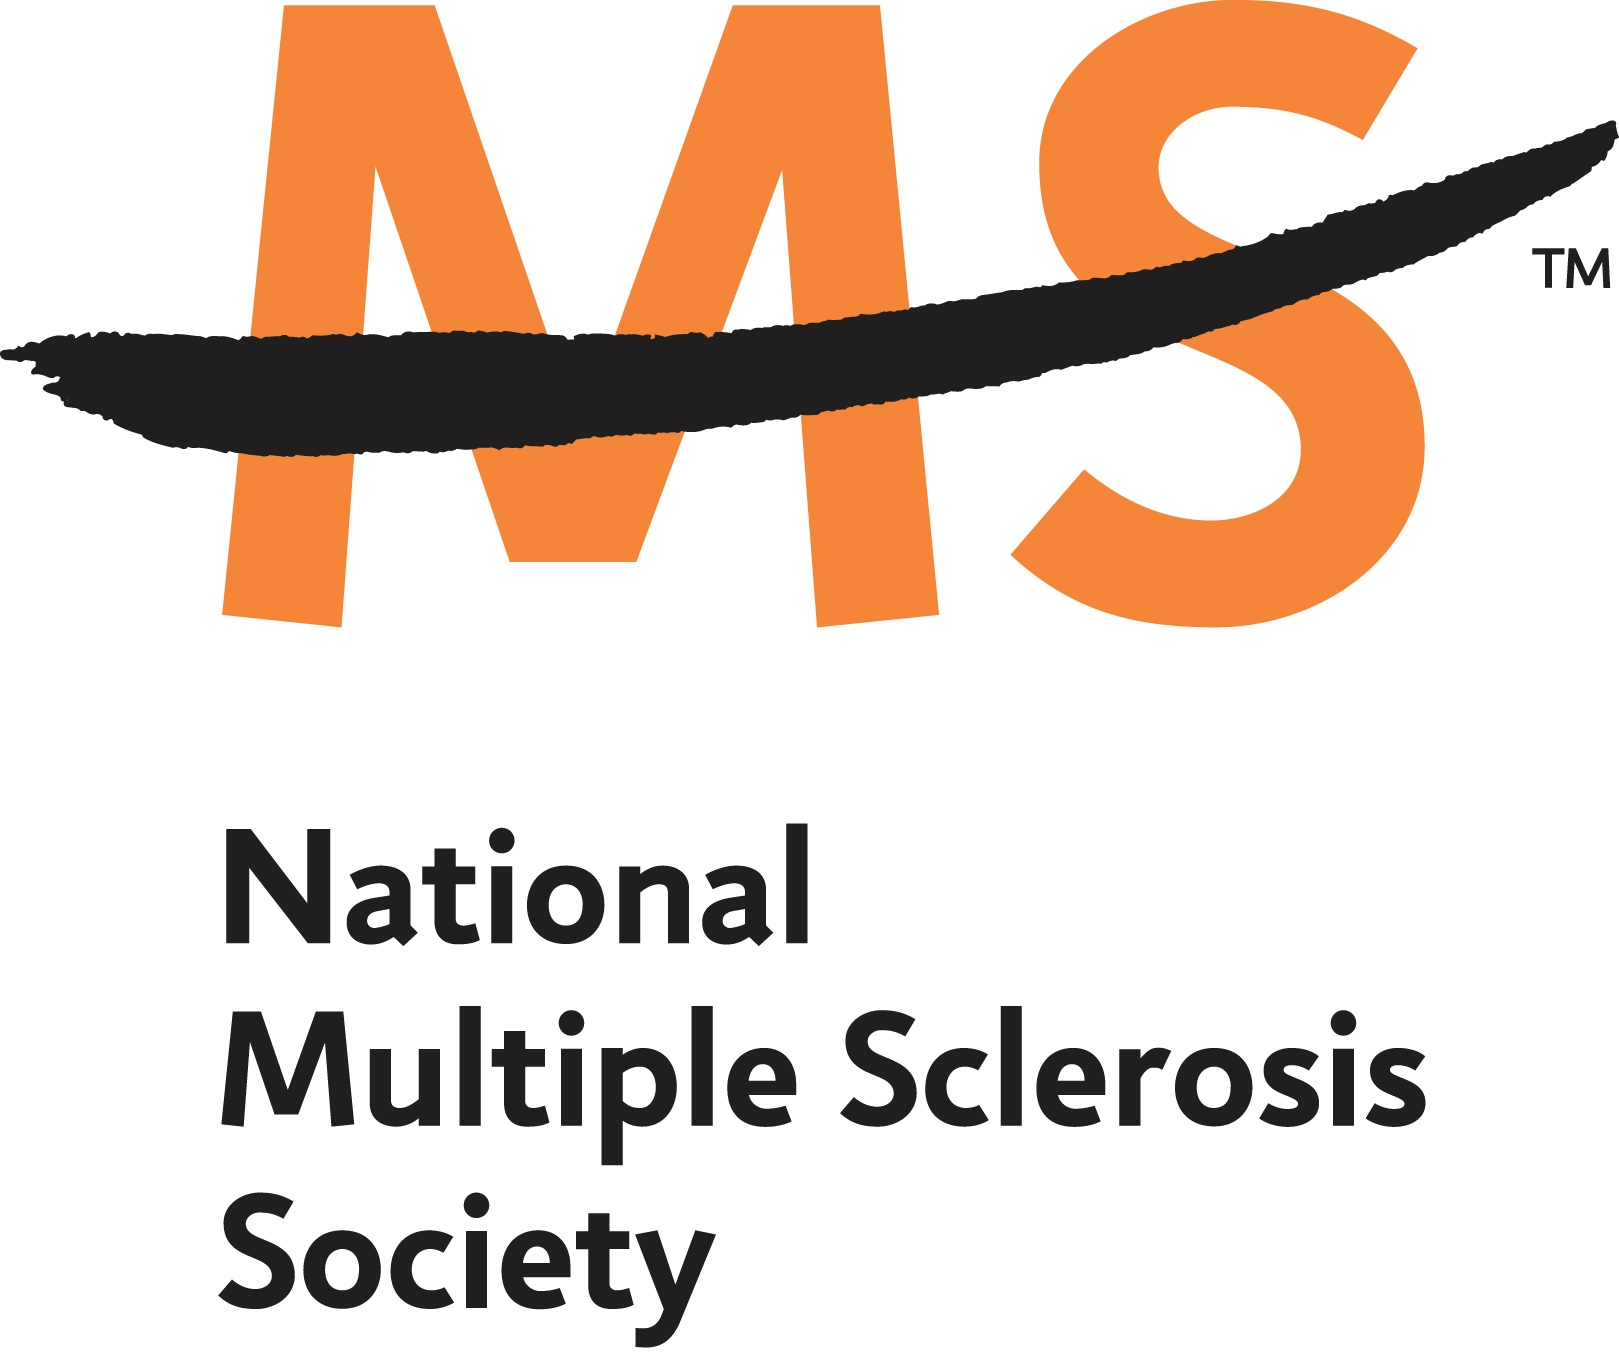 50dabdf6c7fd667f3822_Multiple_Sclerosis.jpg